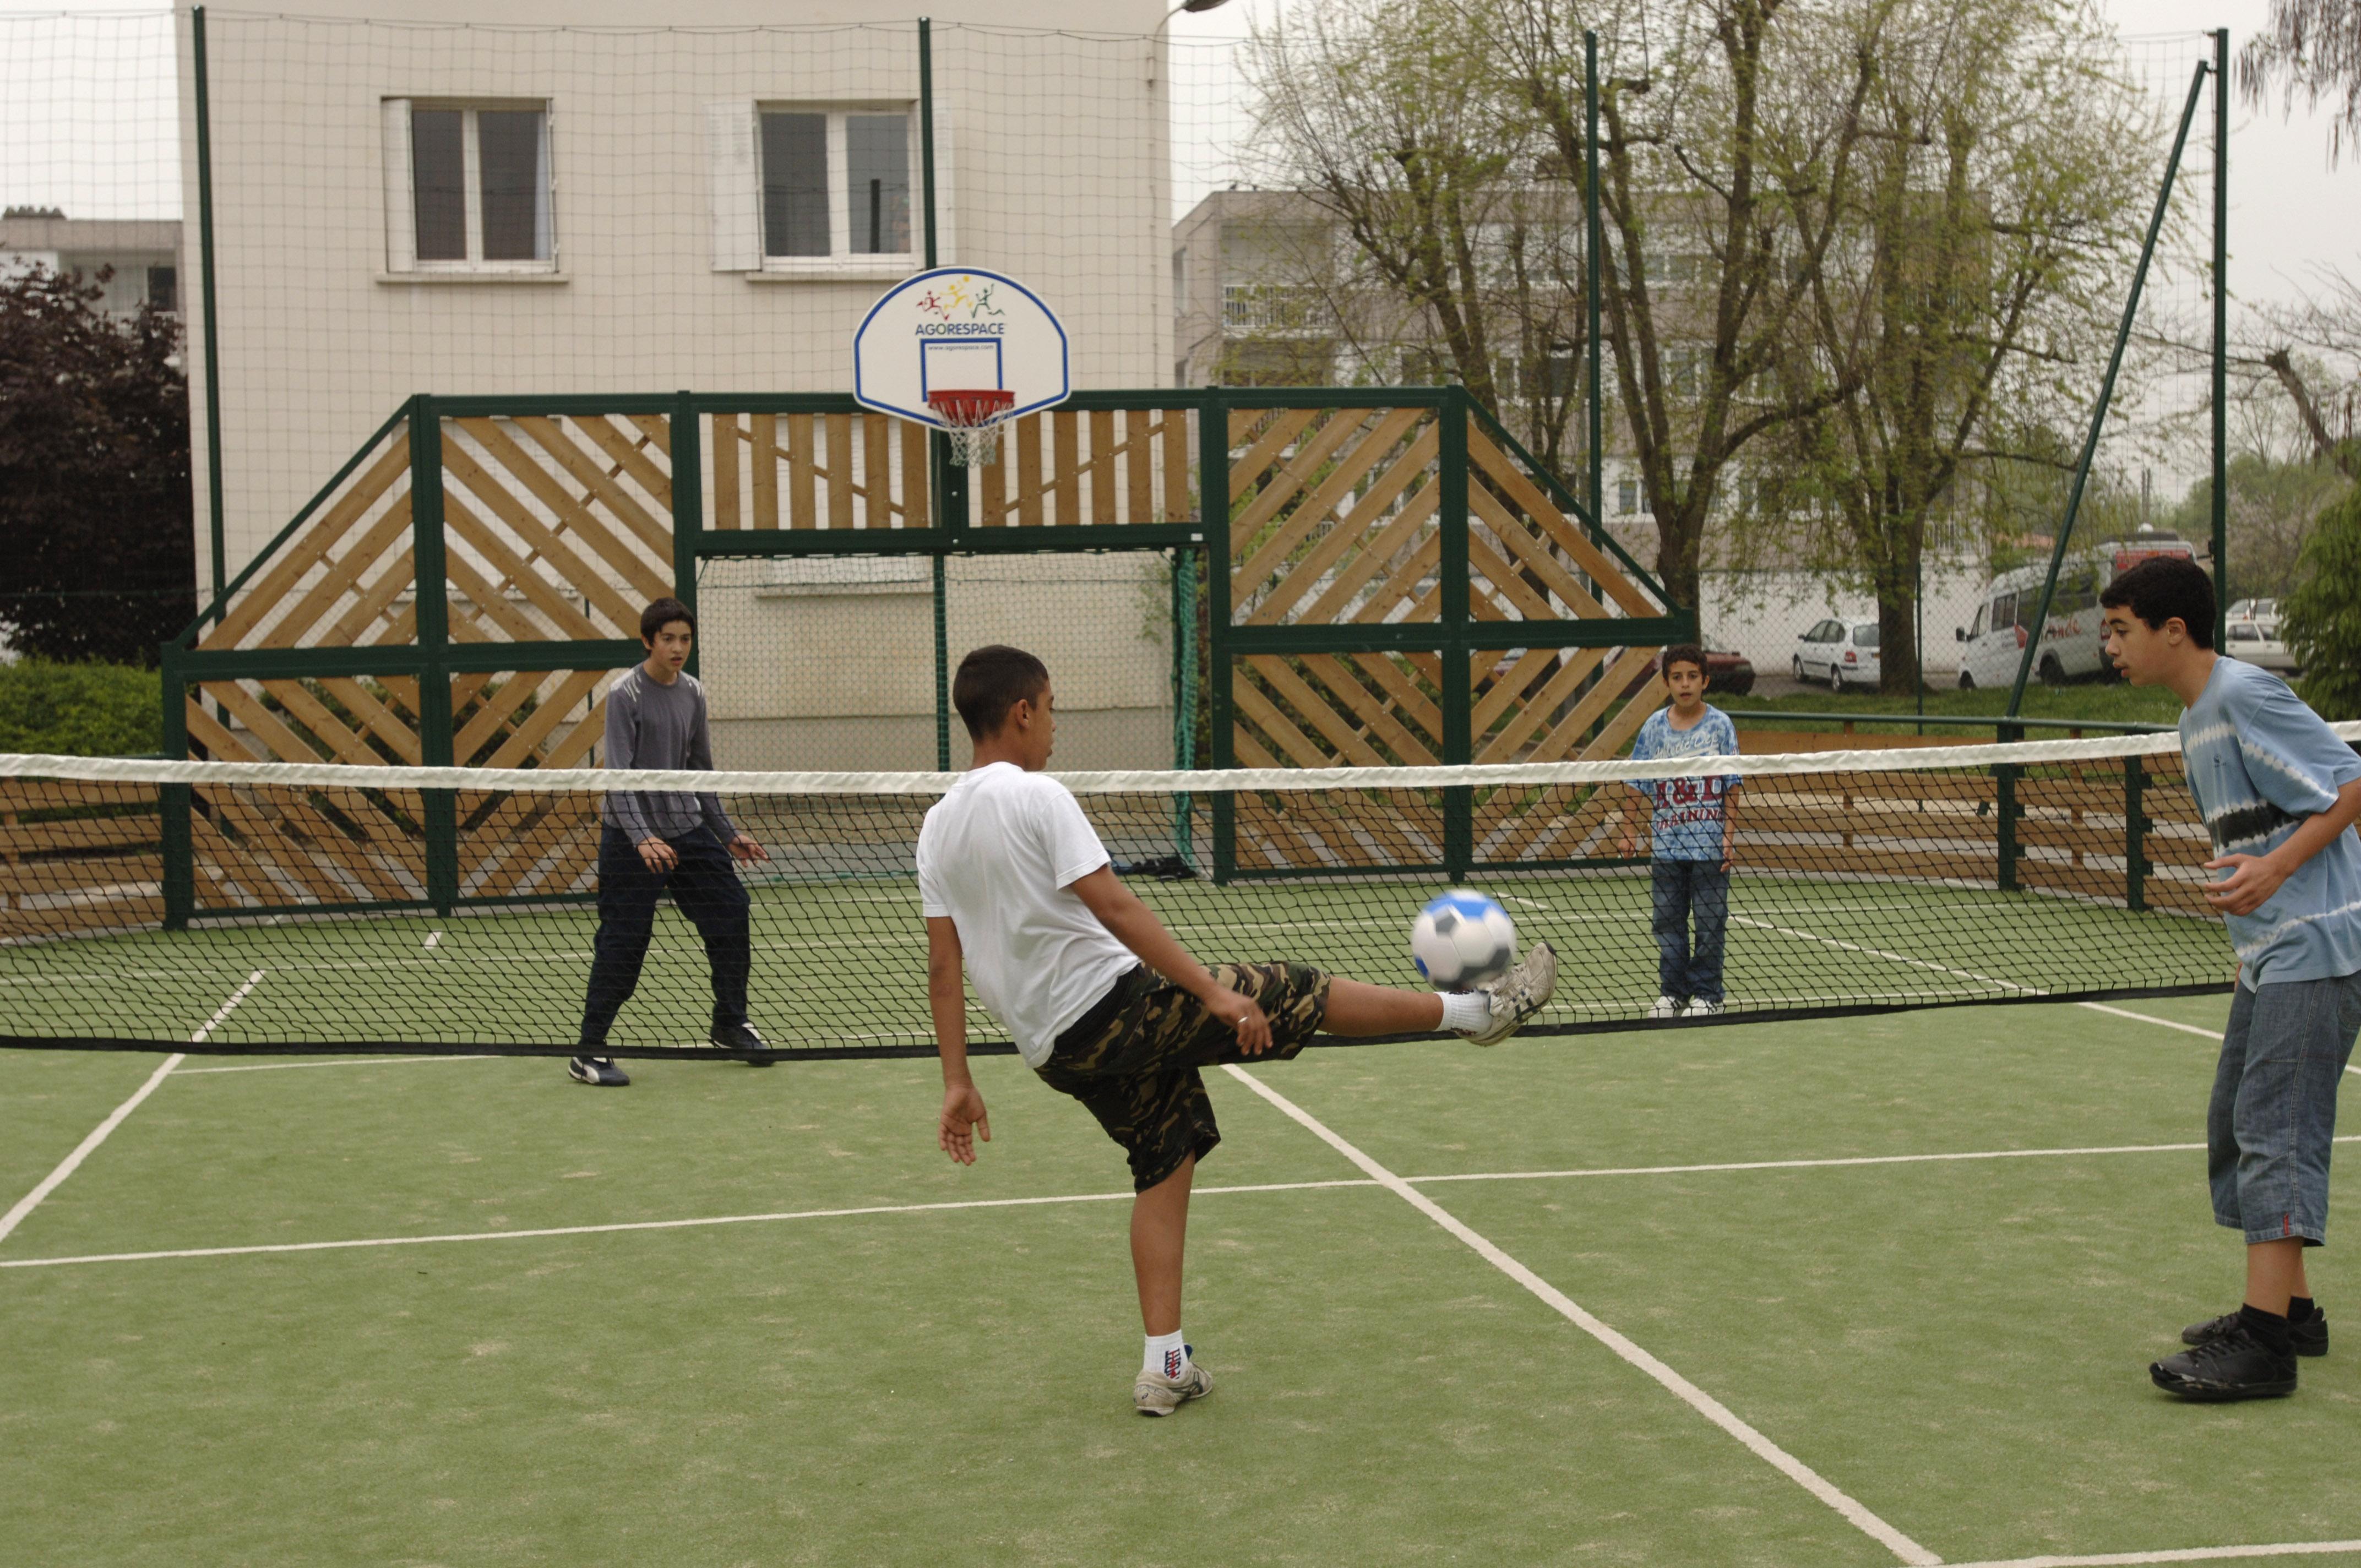 Tennis-ballon-futnet